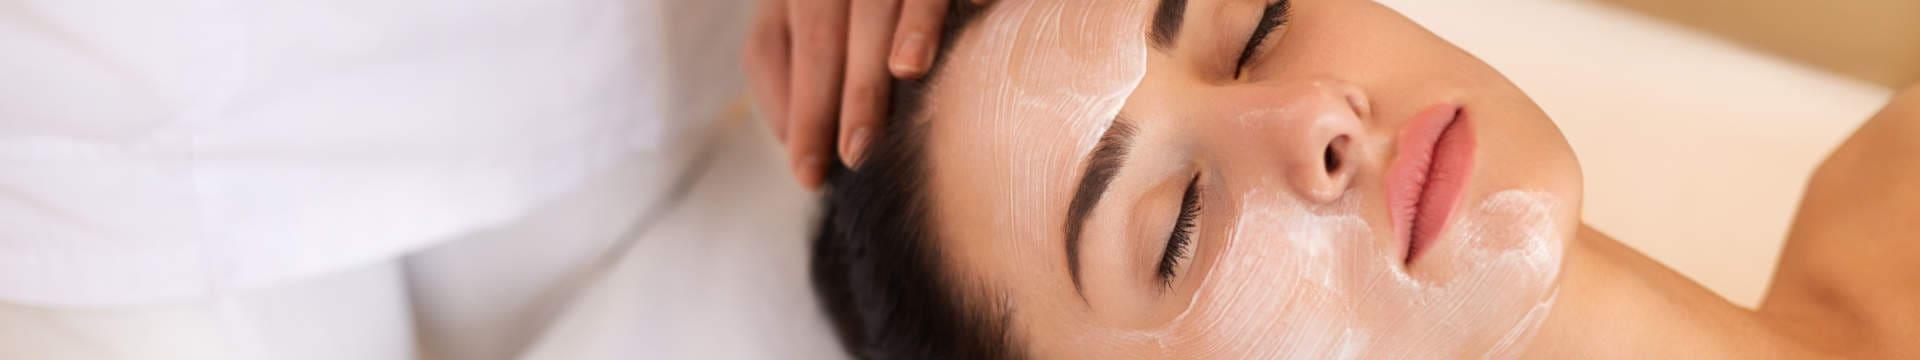 Zabiegi kwasami Peel Mission: Aza Peel,  Lacto Peel,  Skin Revital,  Vitamin C Peel